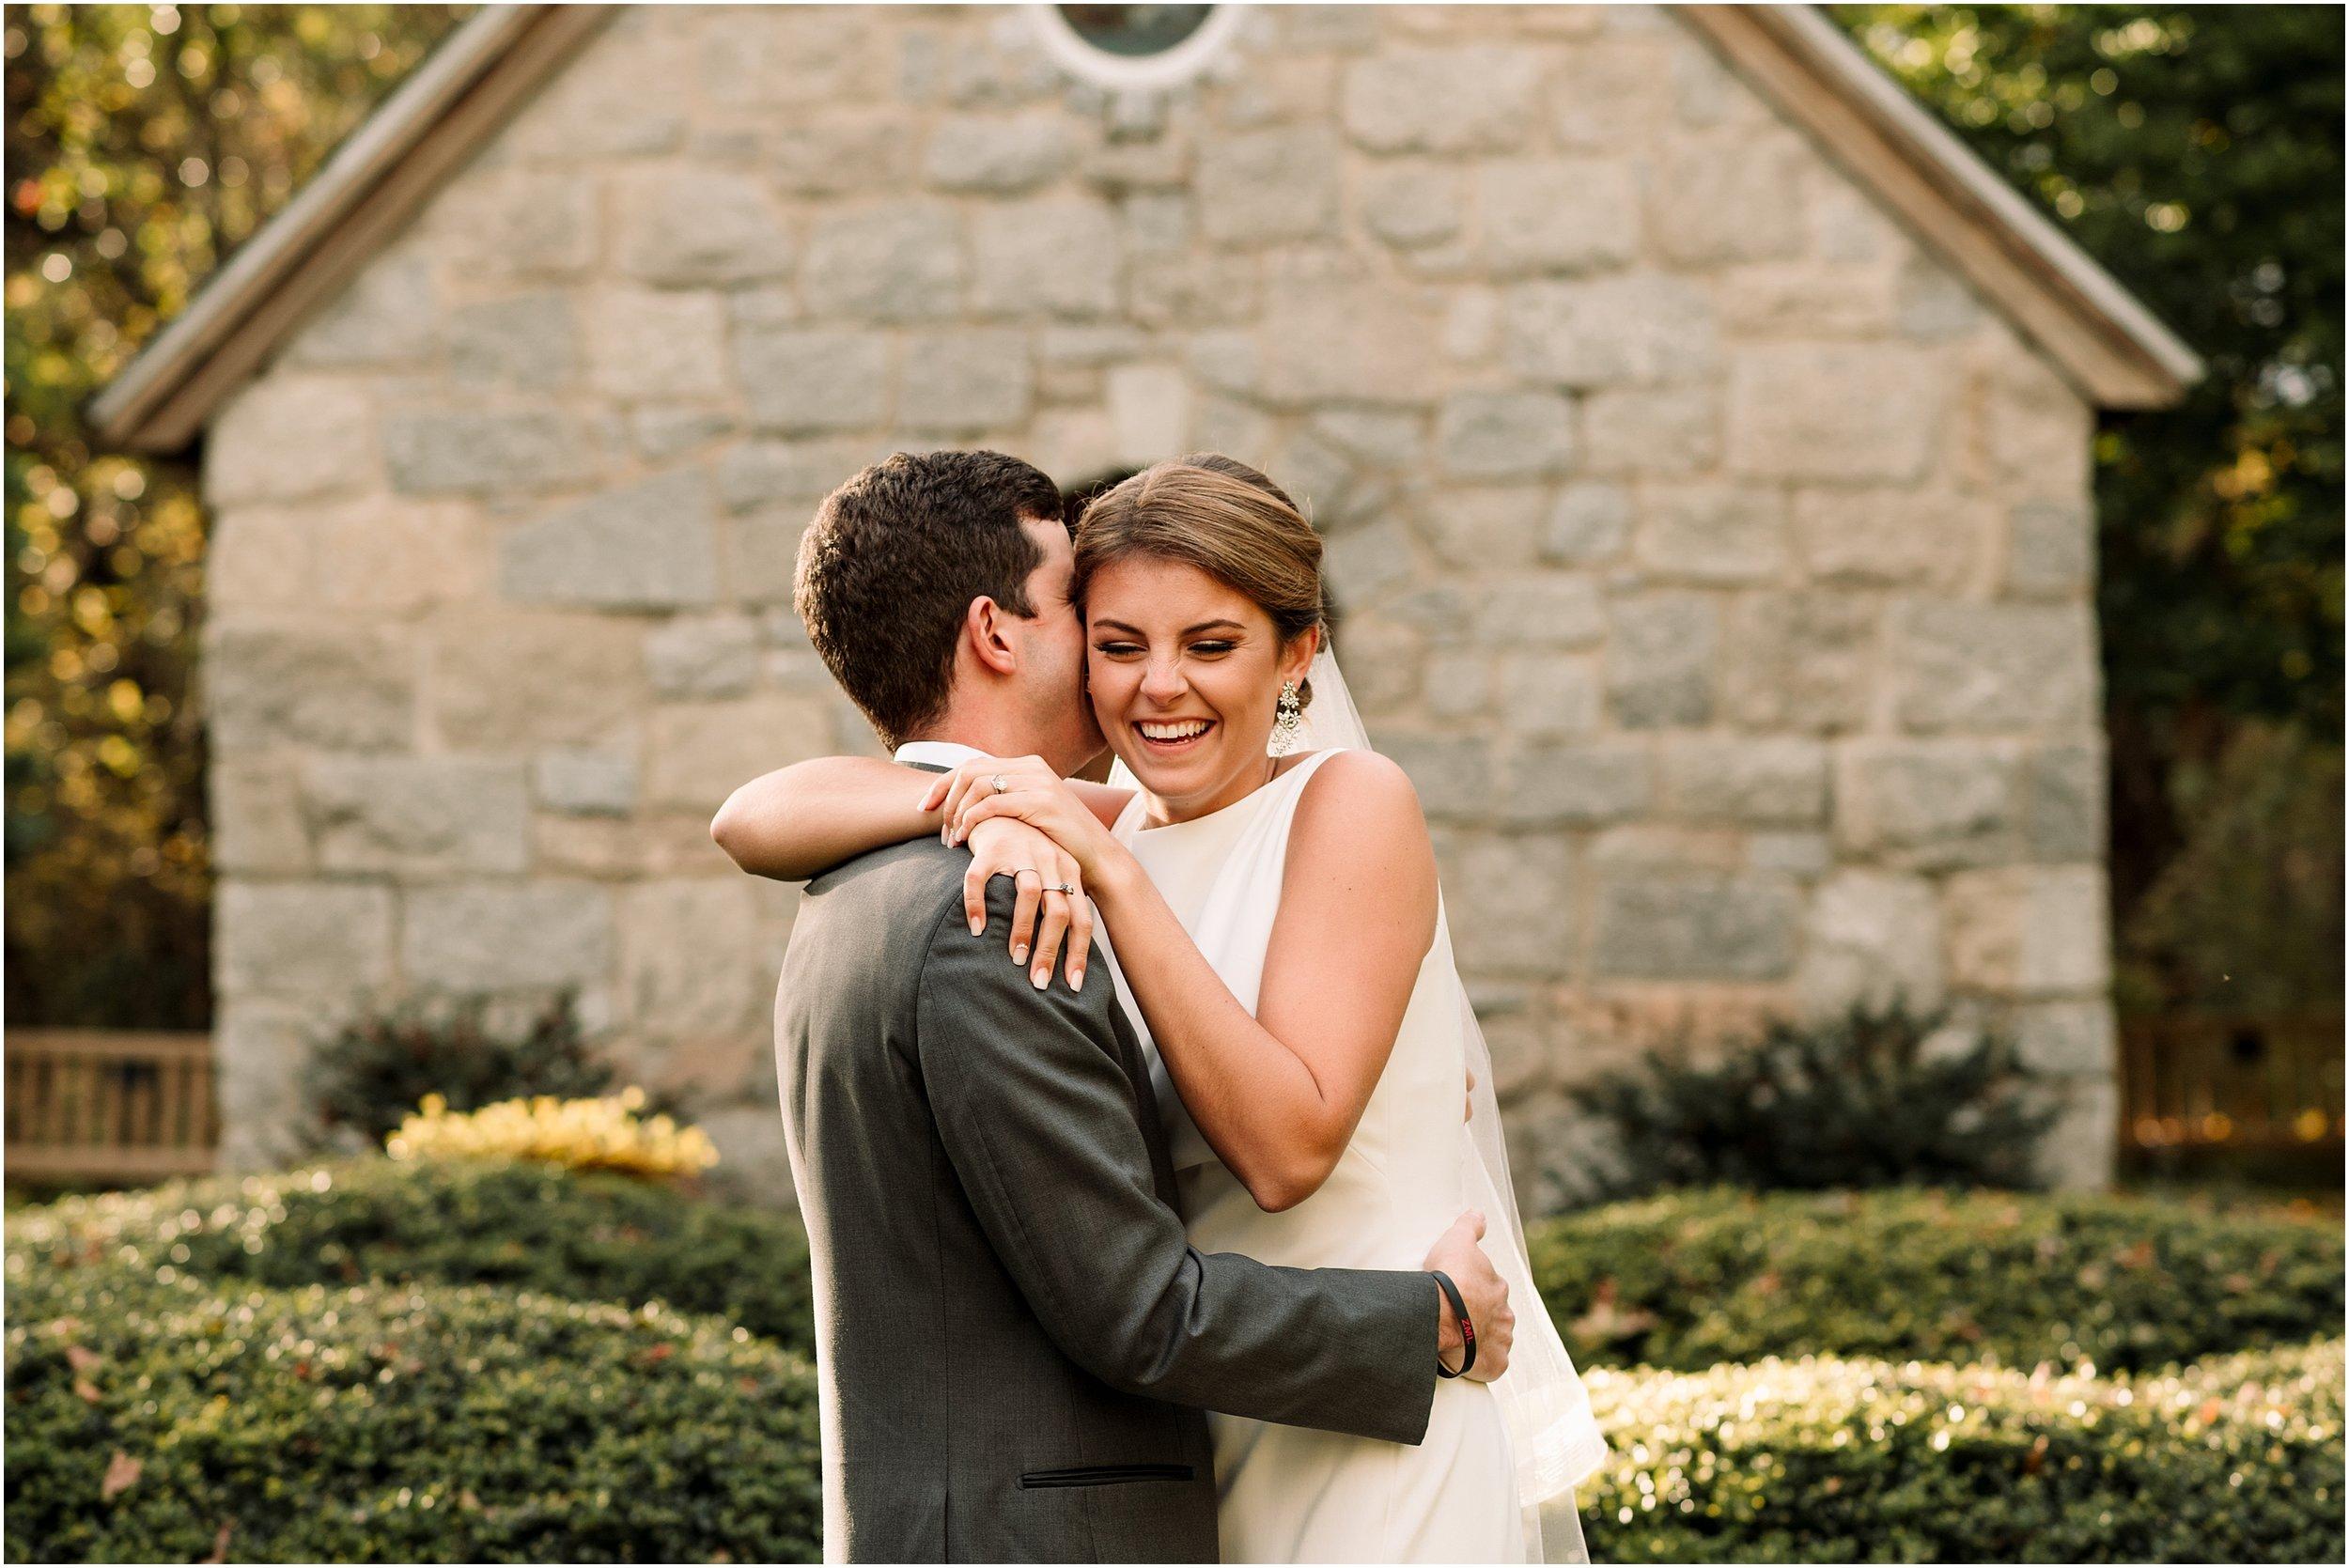 hannah leigh photography ellicott city church wedding baltimore md_2133.jpg